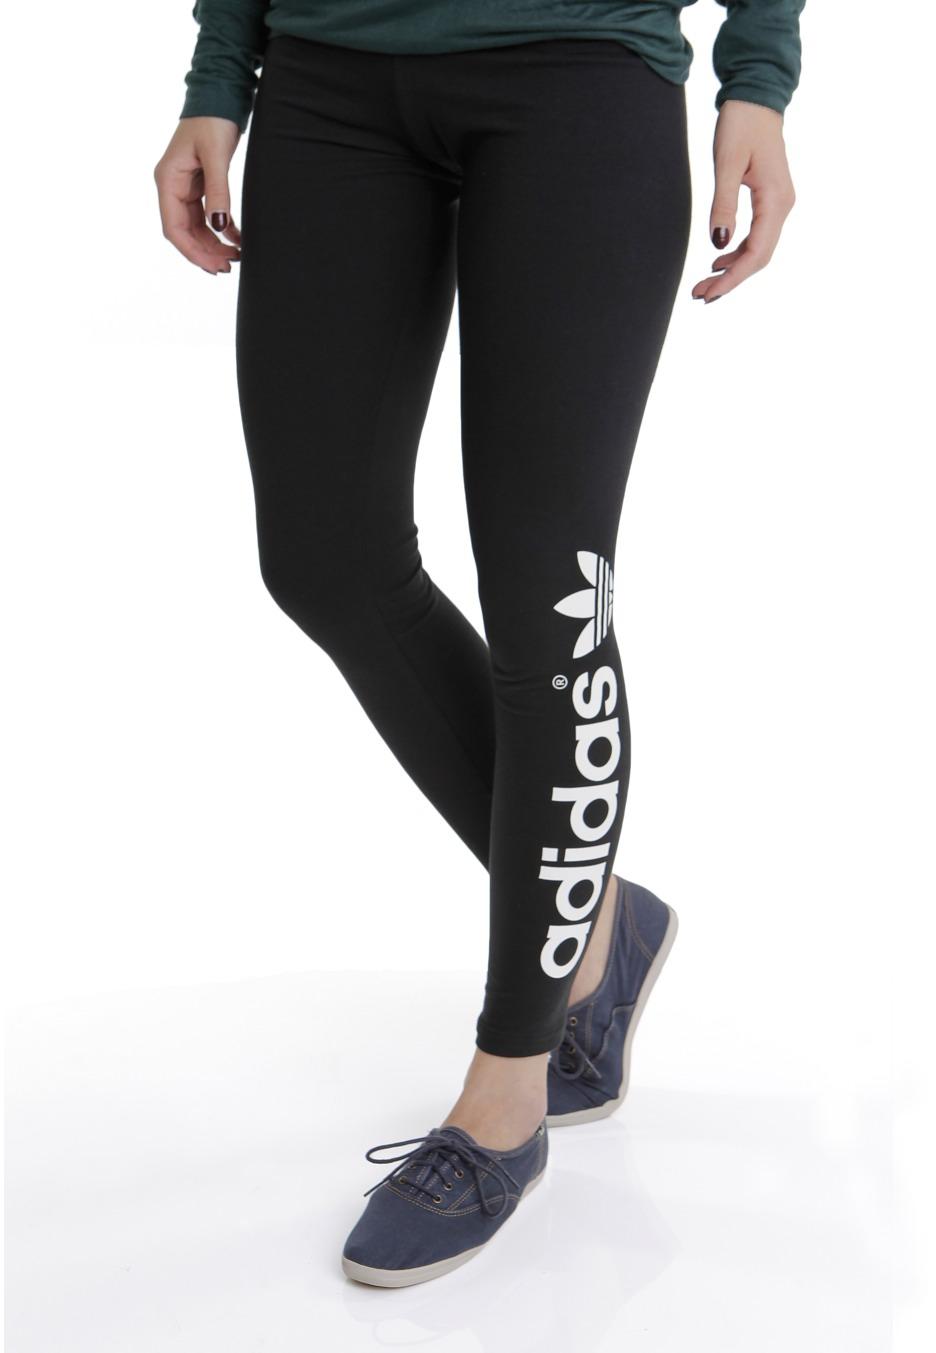 Adidas - Trefoil Black/Running White - Leggings - Boutique streetwear - Impericon.com FR